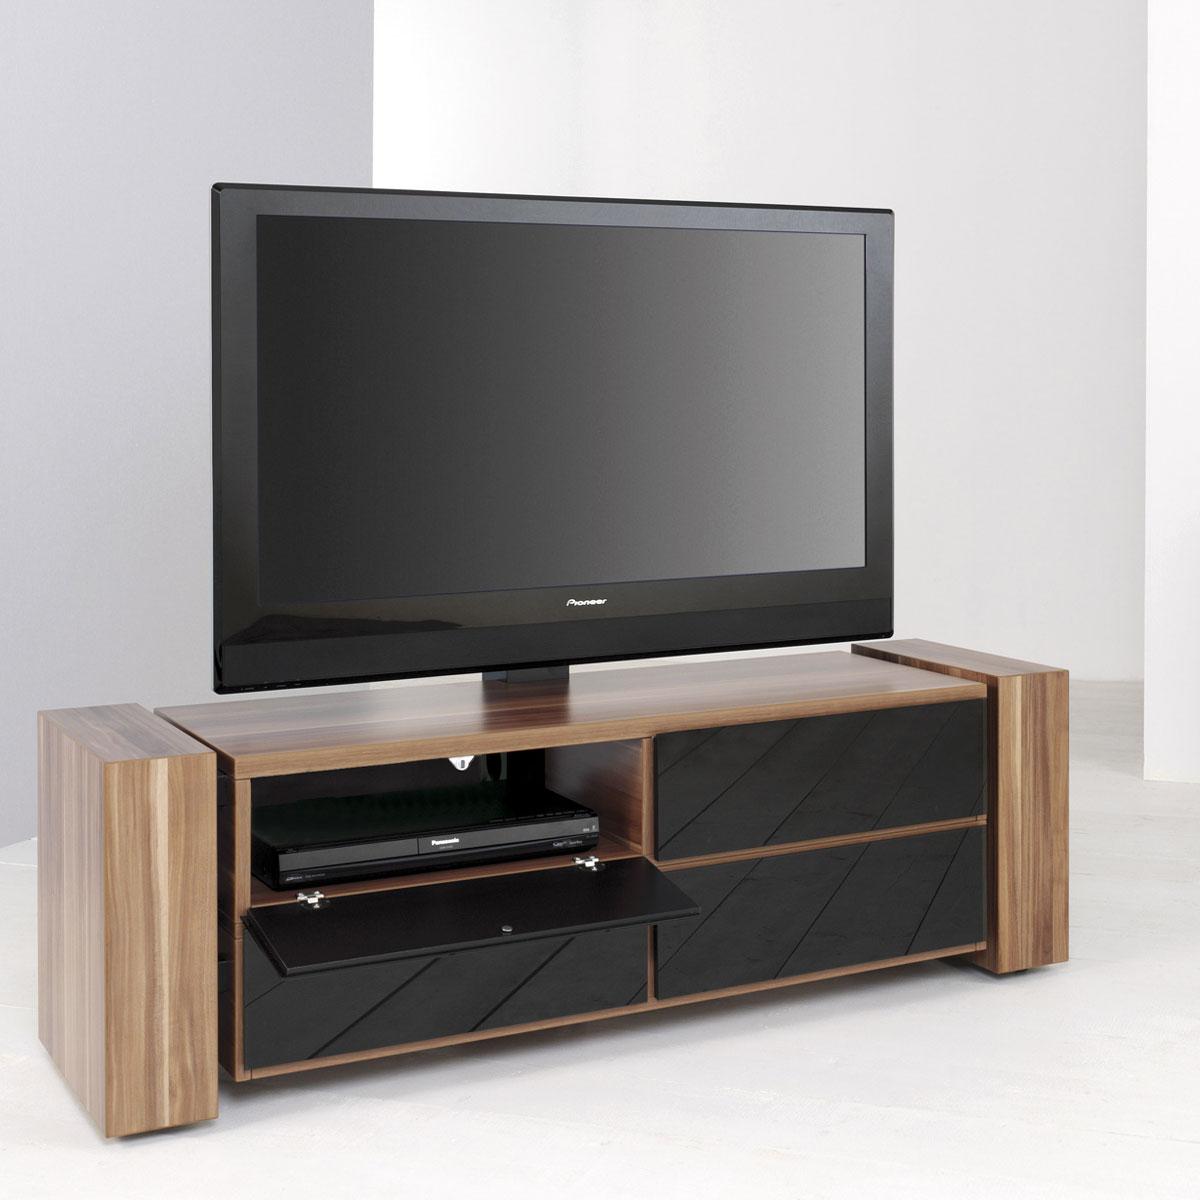 tv rack holz rollen tv mobel eiche glas hochglanz sonoma conforama